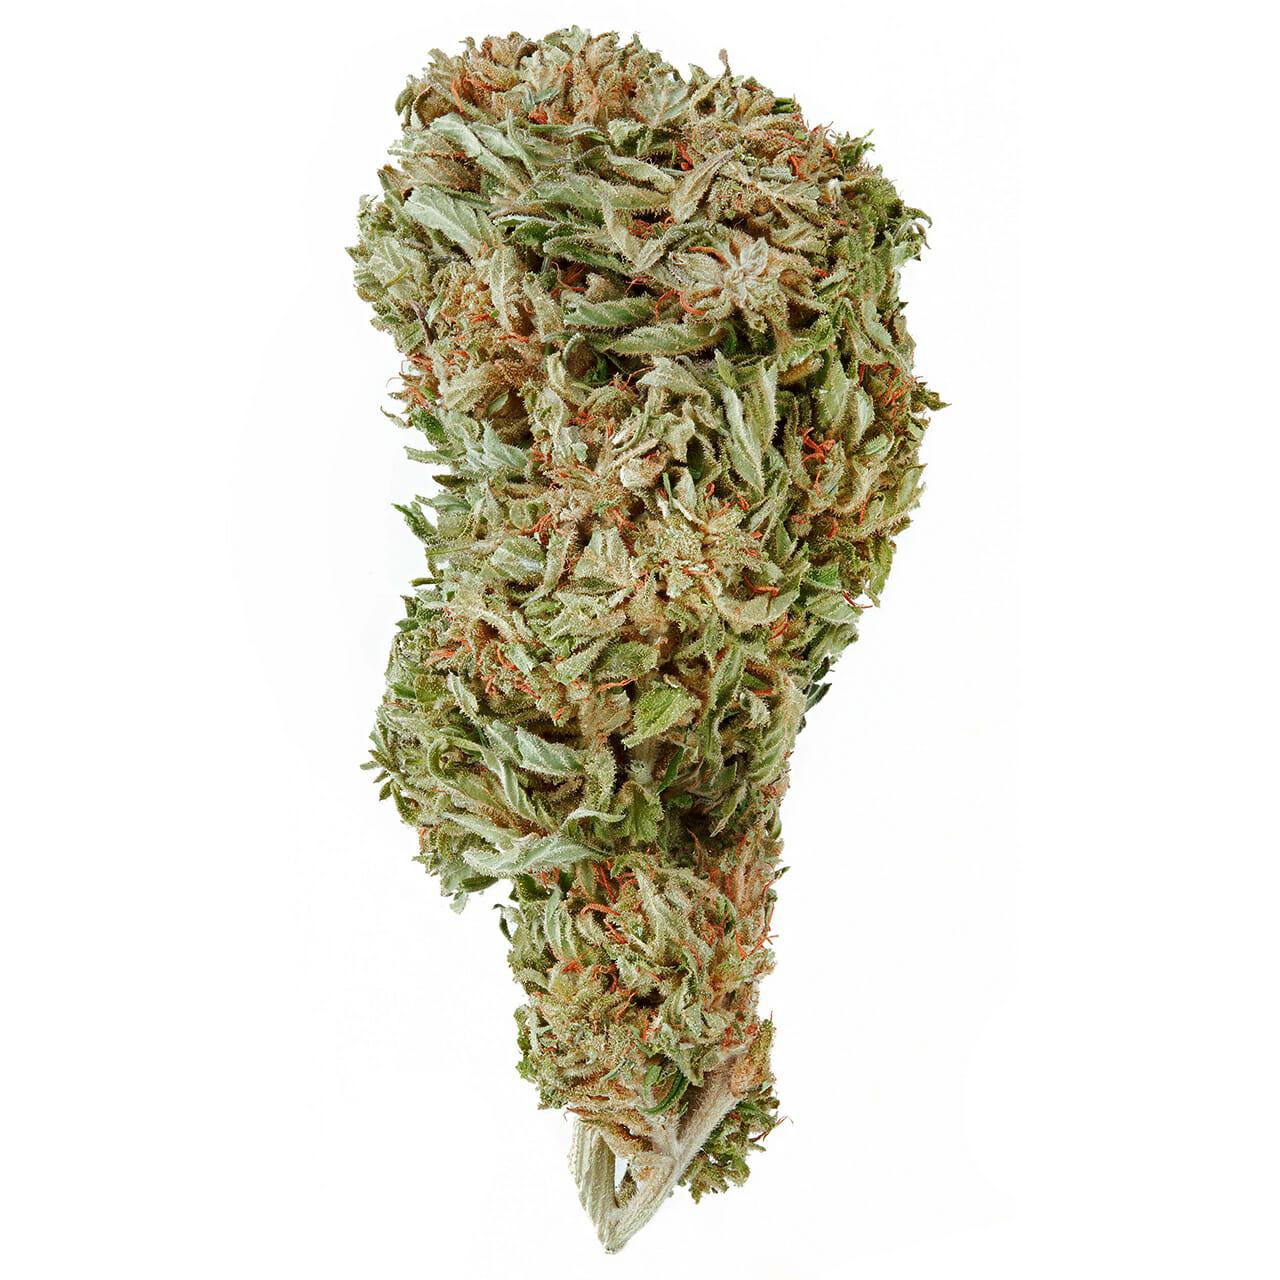 Frosted Kush CBD Flower